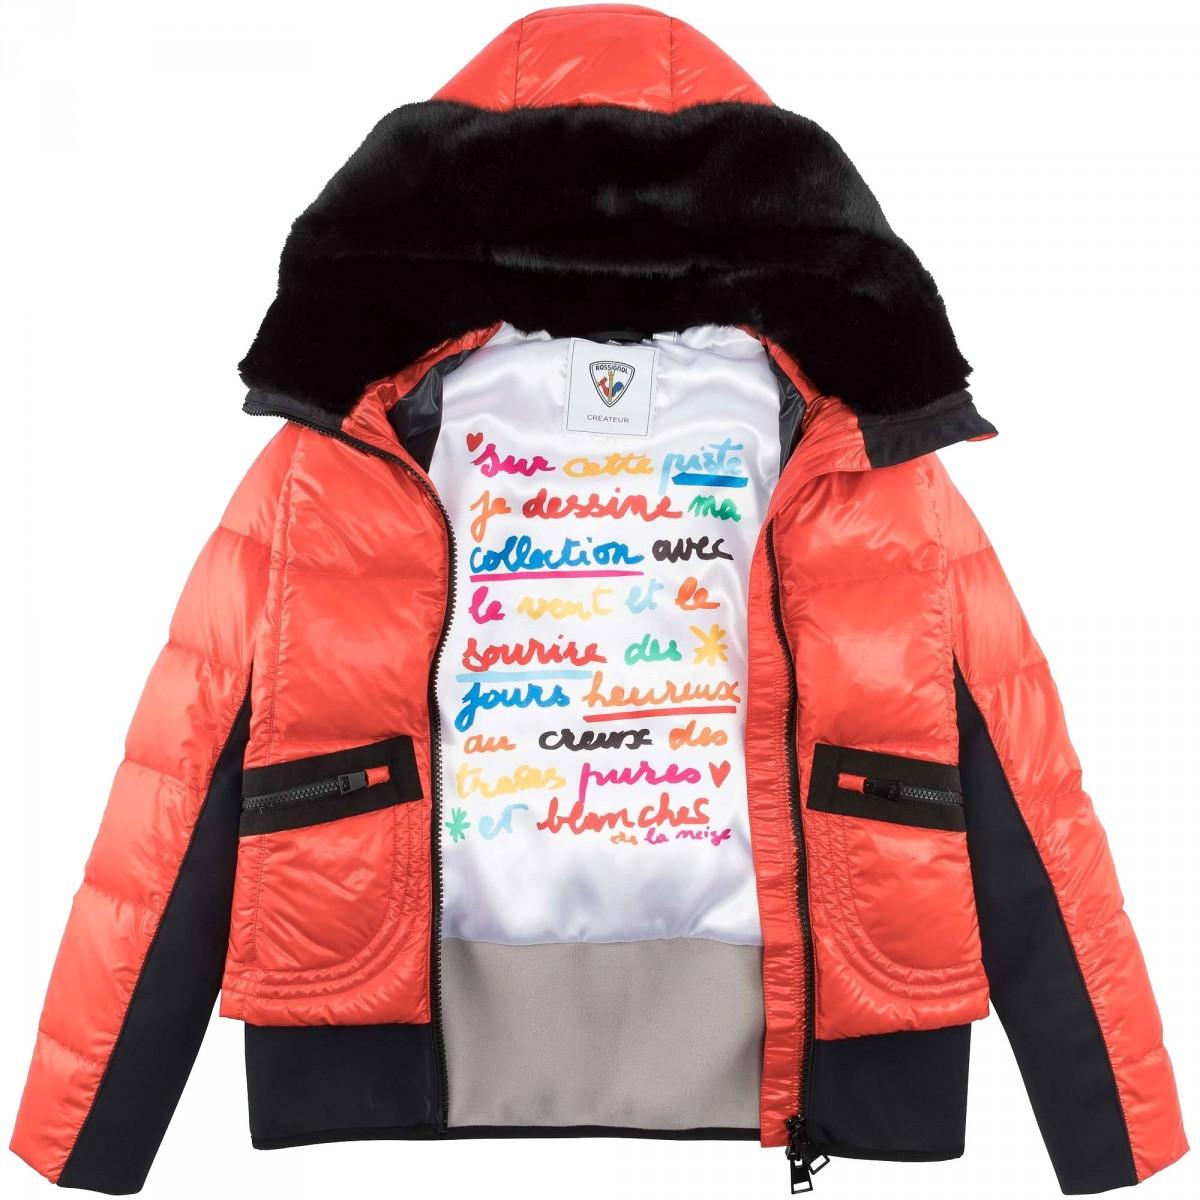 Vêtements Bomber Ski Rzqre8vx Yakima Femme Veste Rossignol X7qAZ